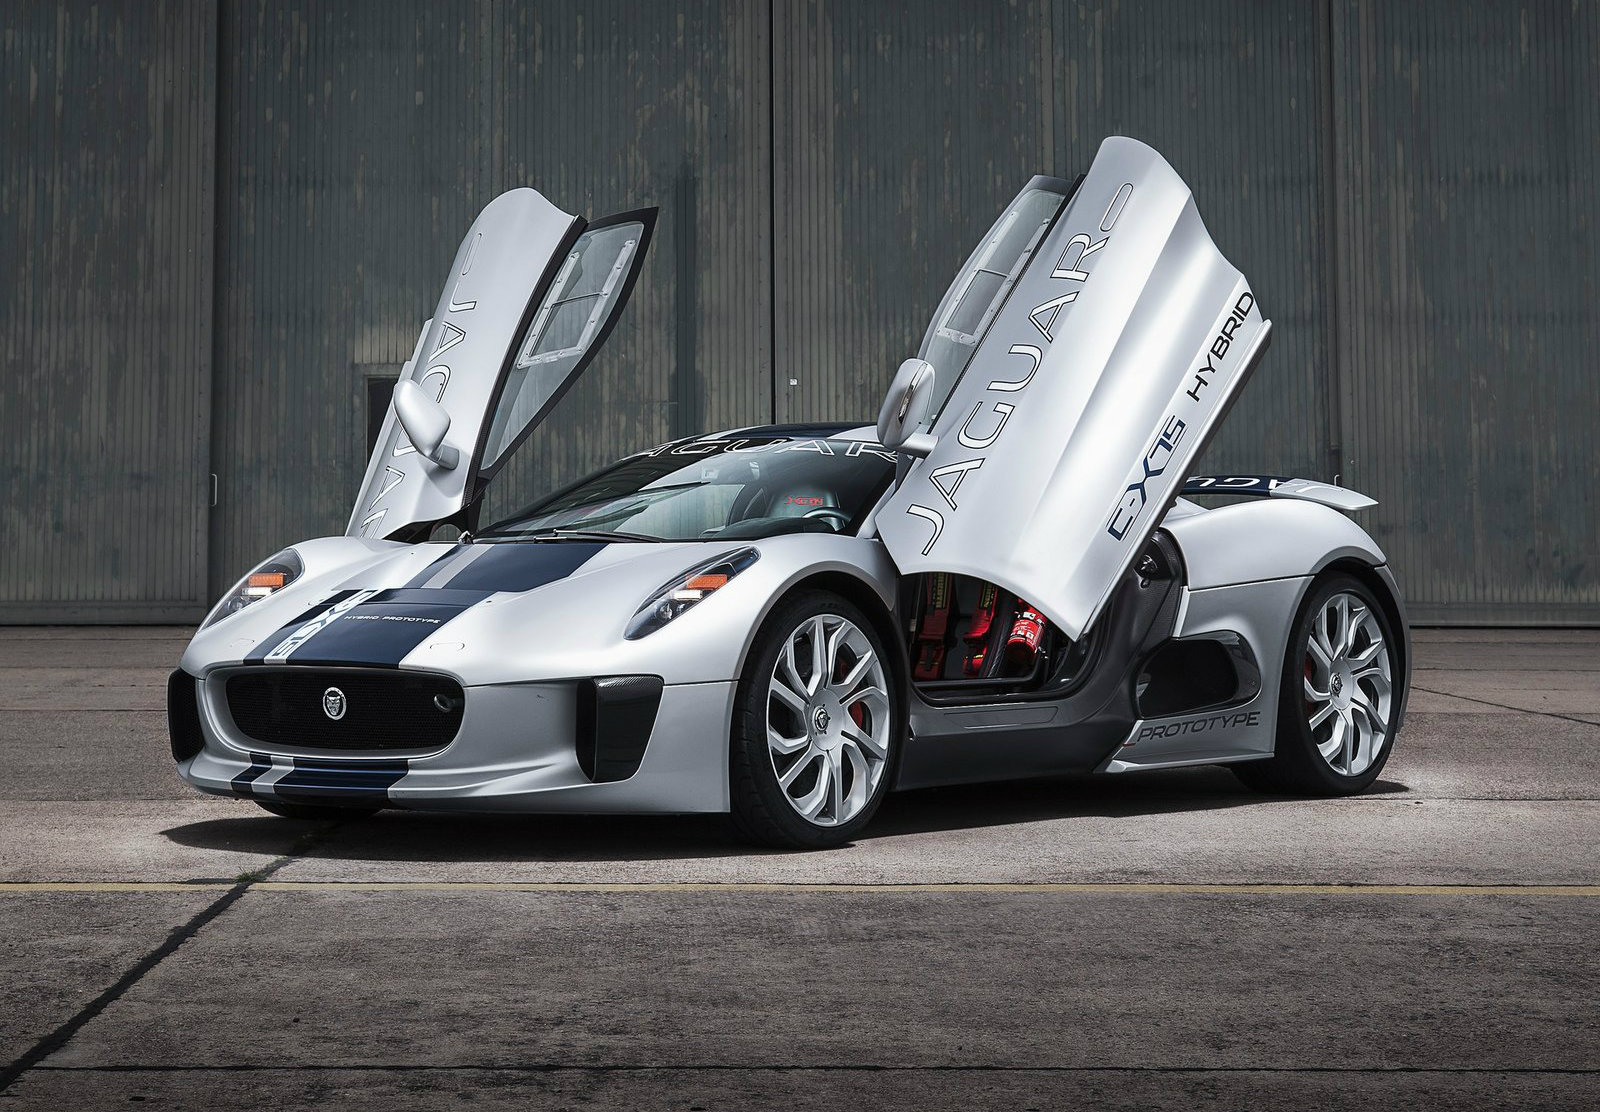 James Bond SPECTRE To Star Jaguar C X75 Its The Baddies